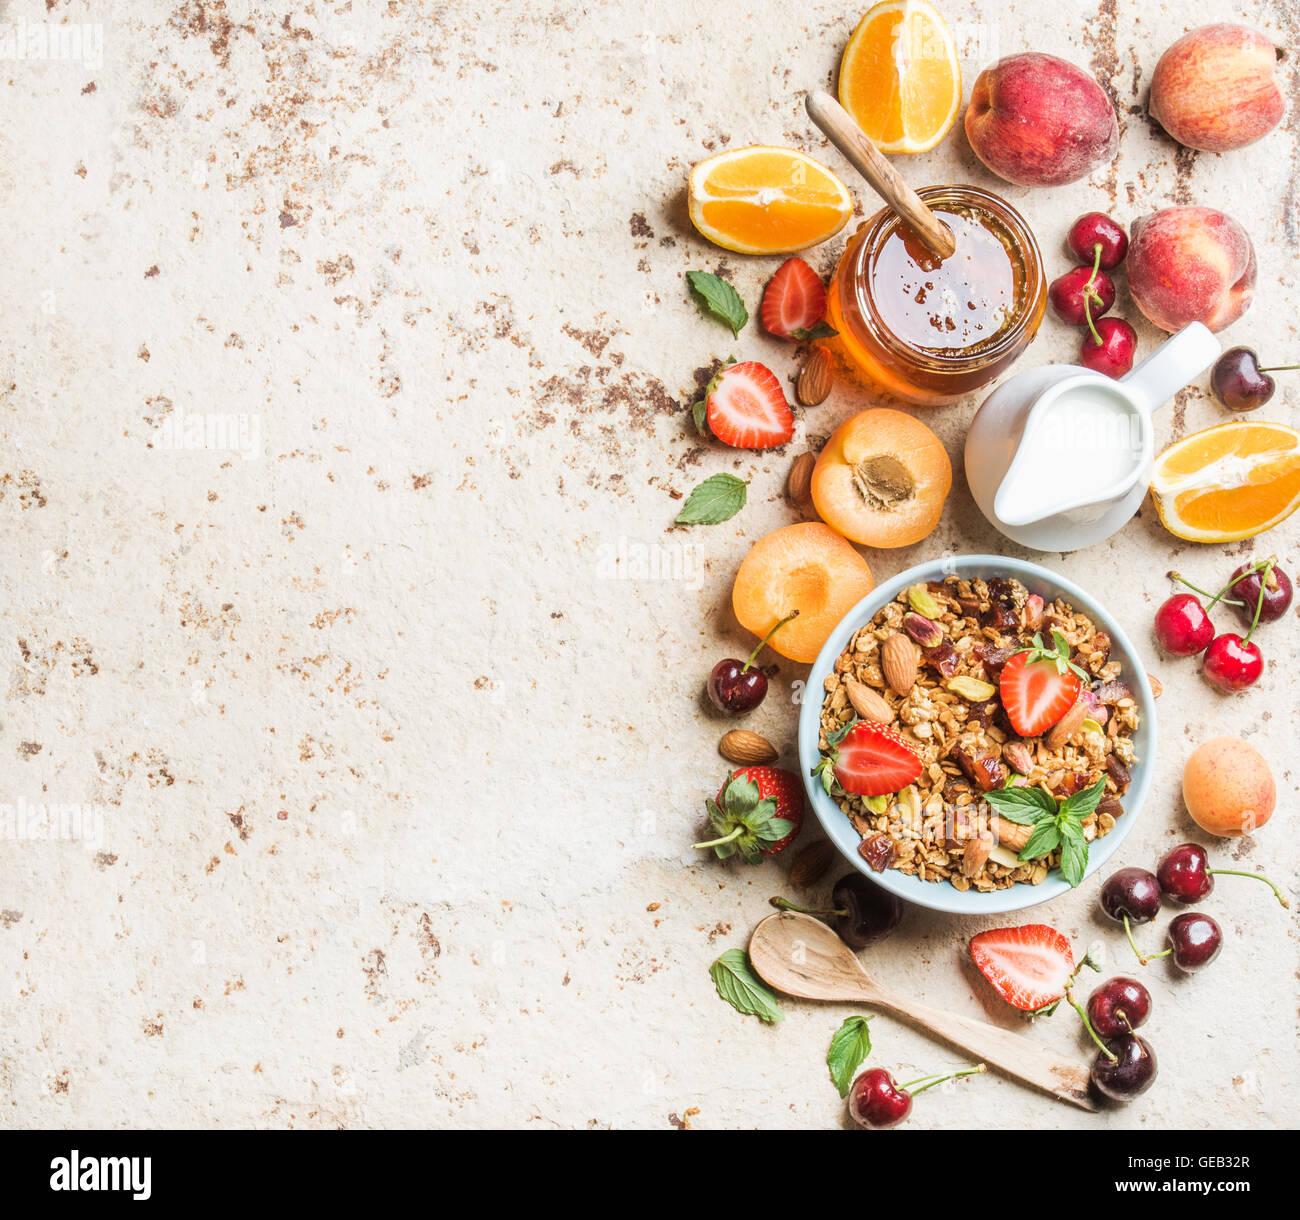 Healthy breakfast ingredients. Bowl of oat granola with milk, fresh fruit, berries and honey - Stock Image